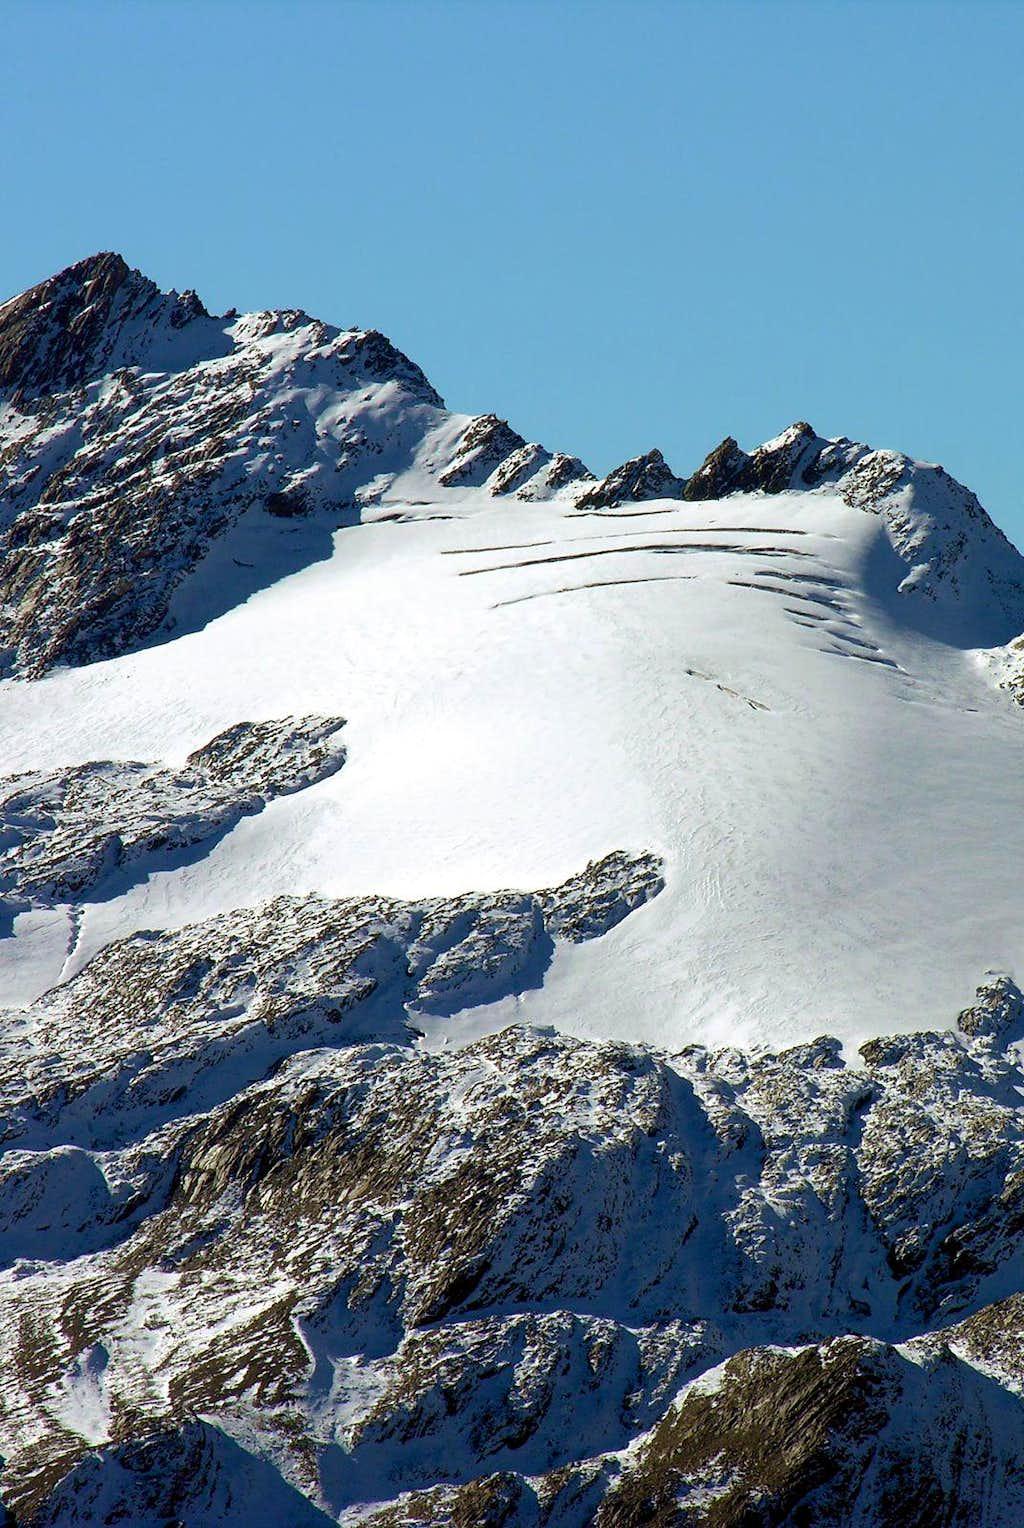 Chavannes Glacier